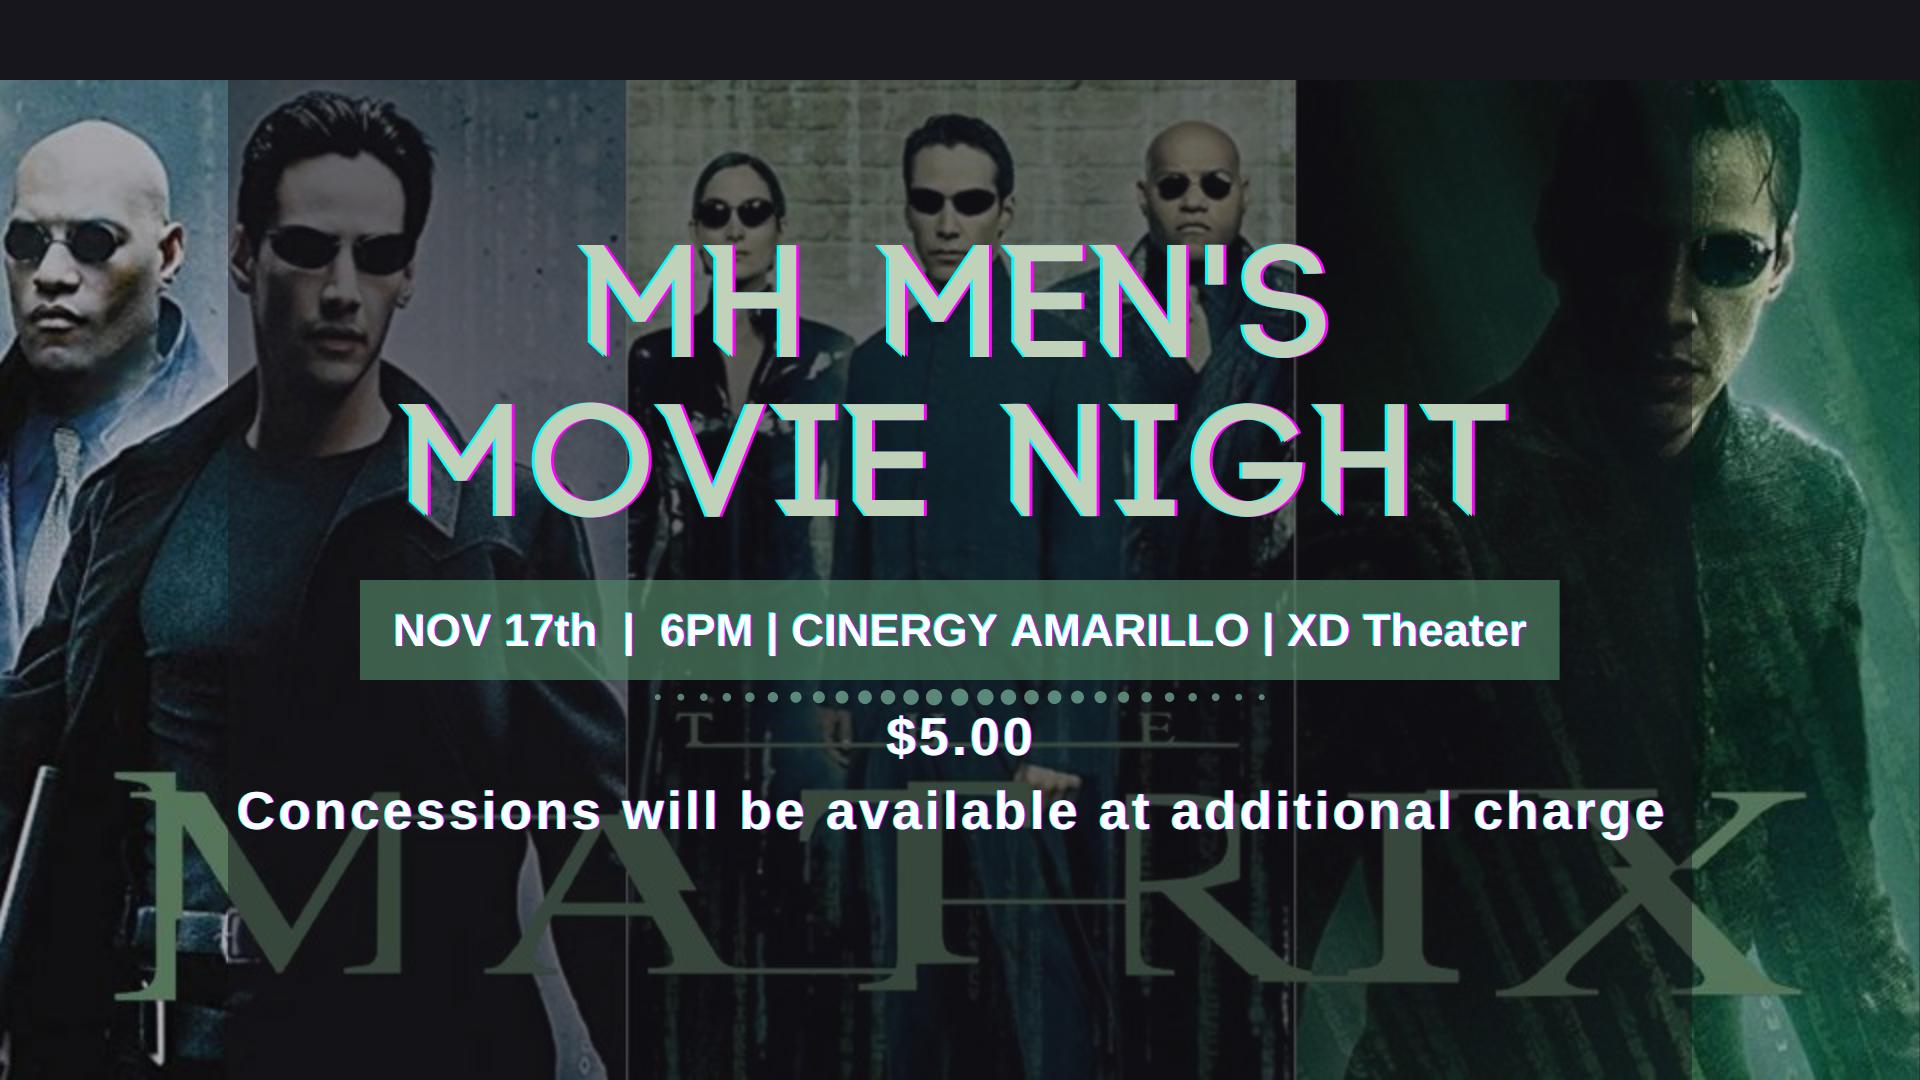 MH MEN's MOVIE NIGHT